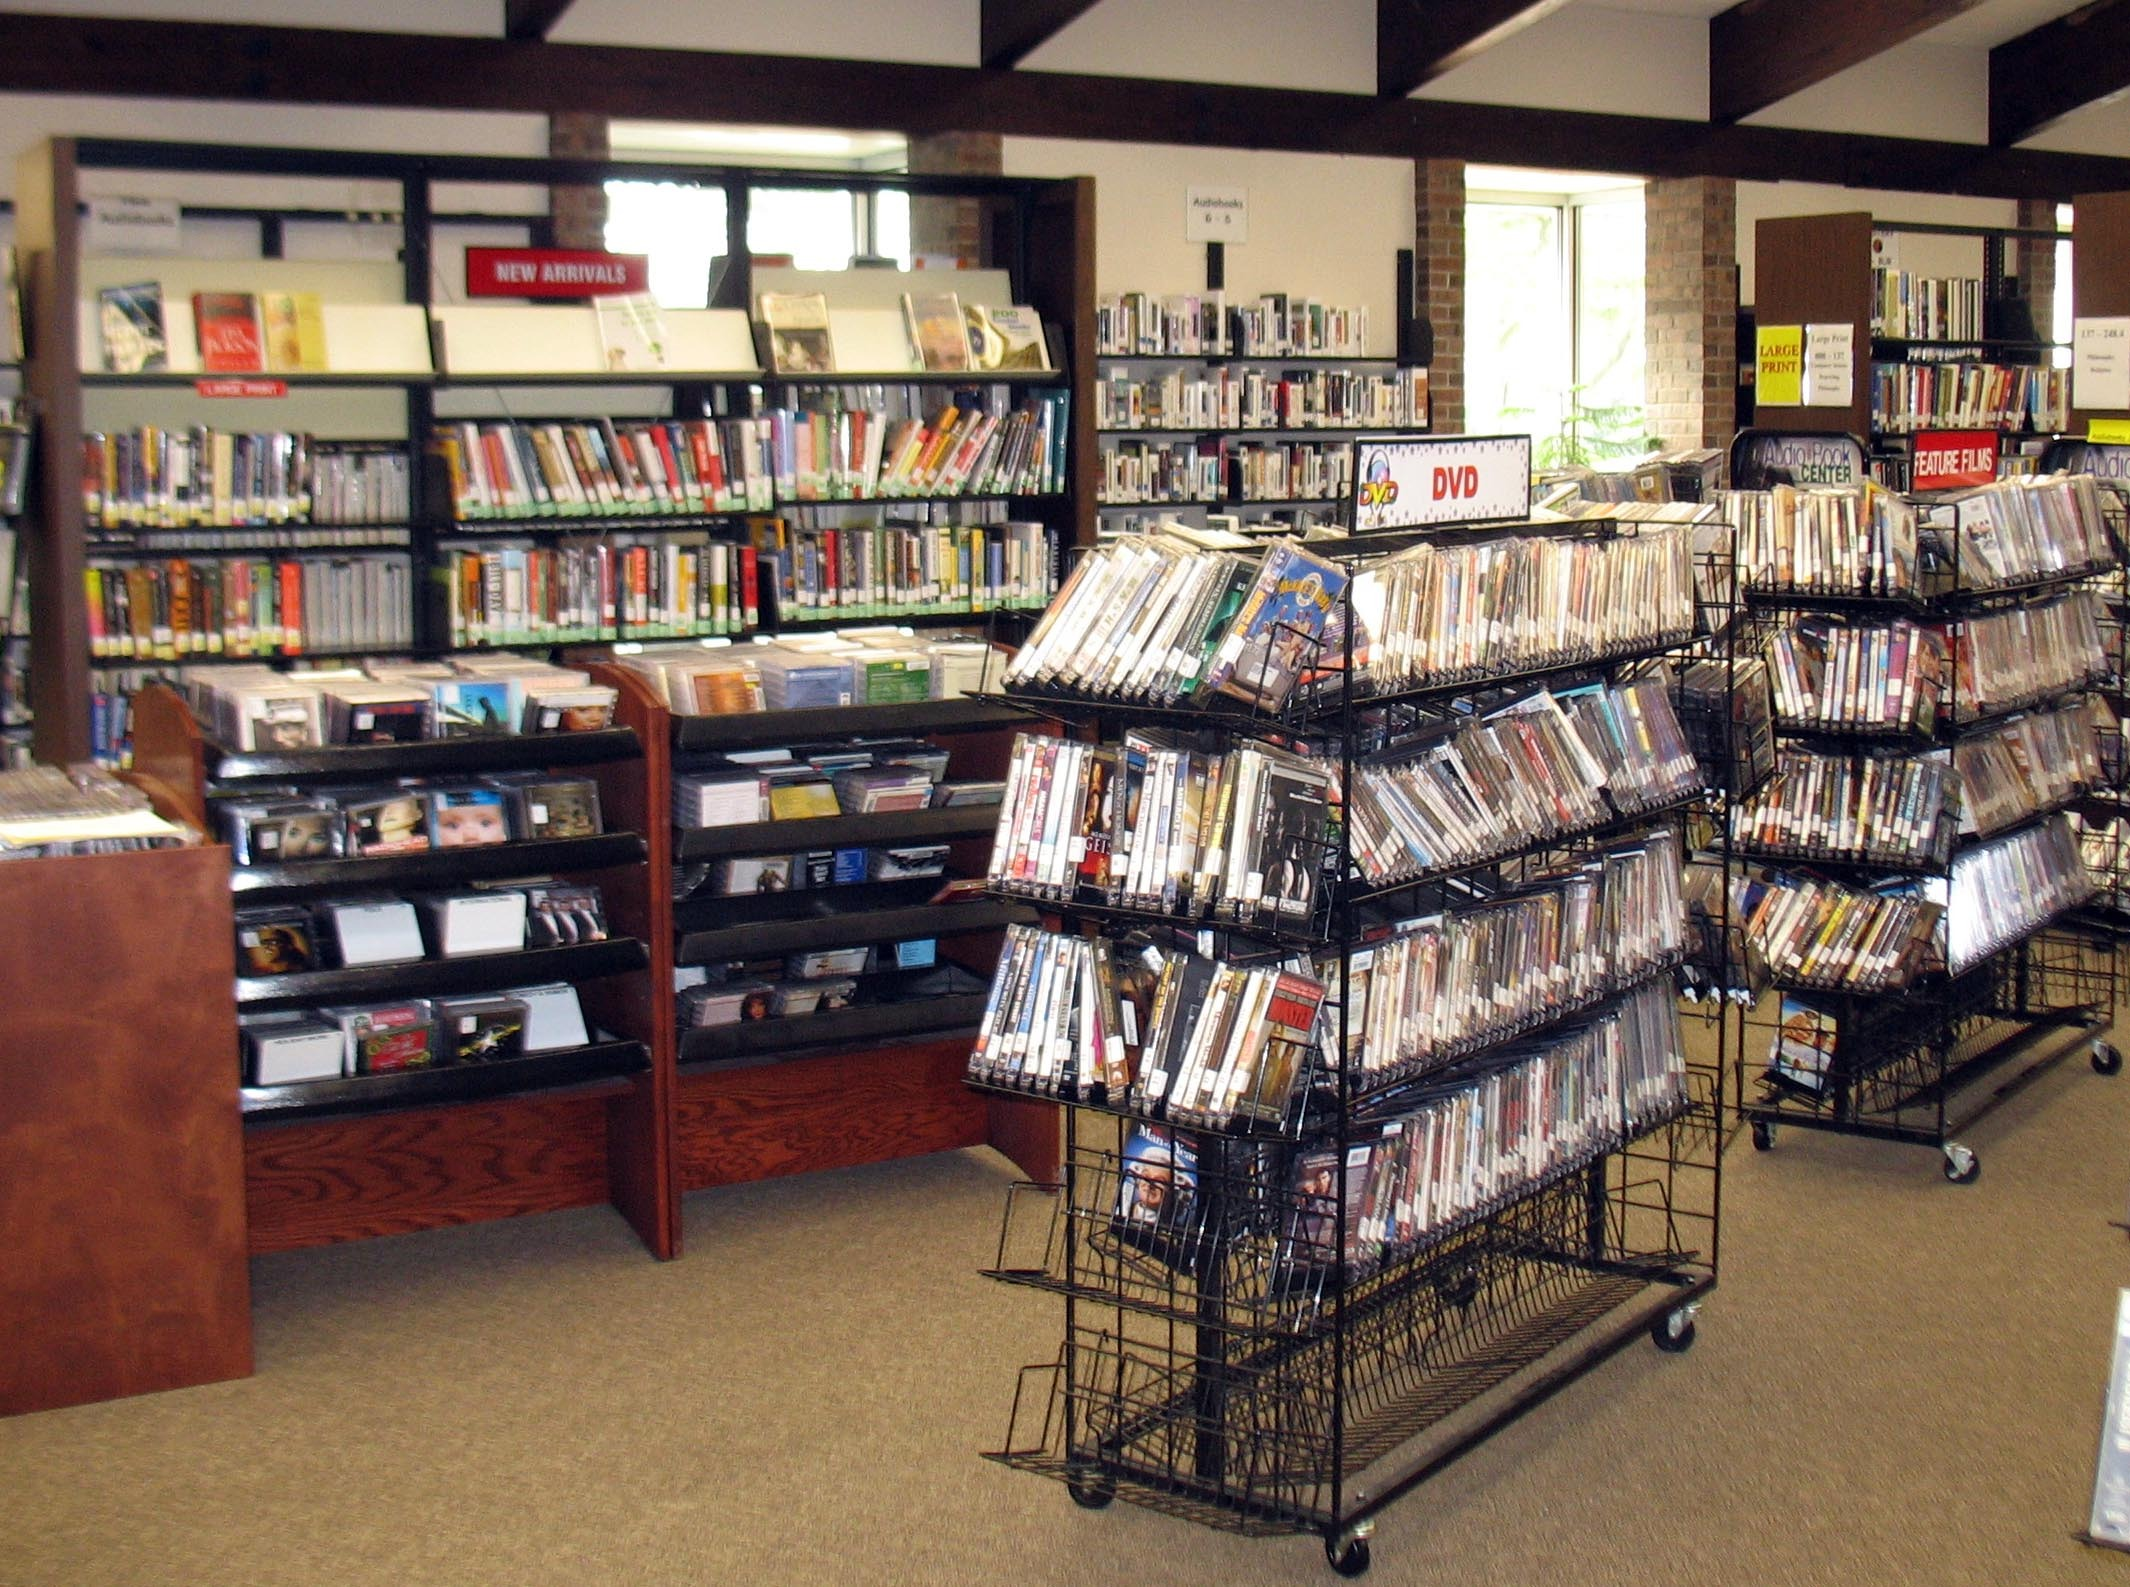 7b0e52892b2a5df7a1be_Scotch_Plains_Library_-_books_on_shelves.jpg